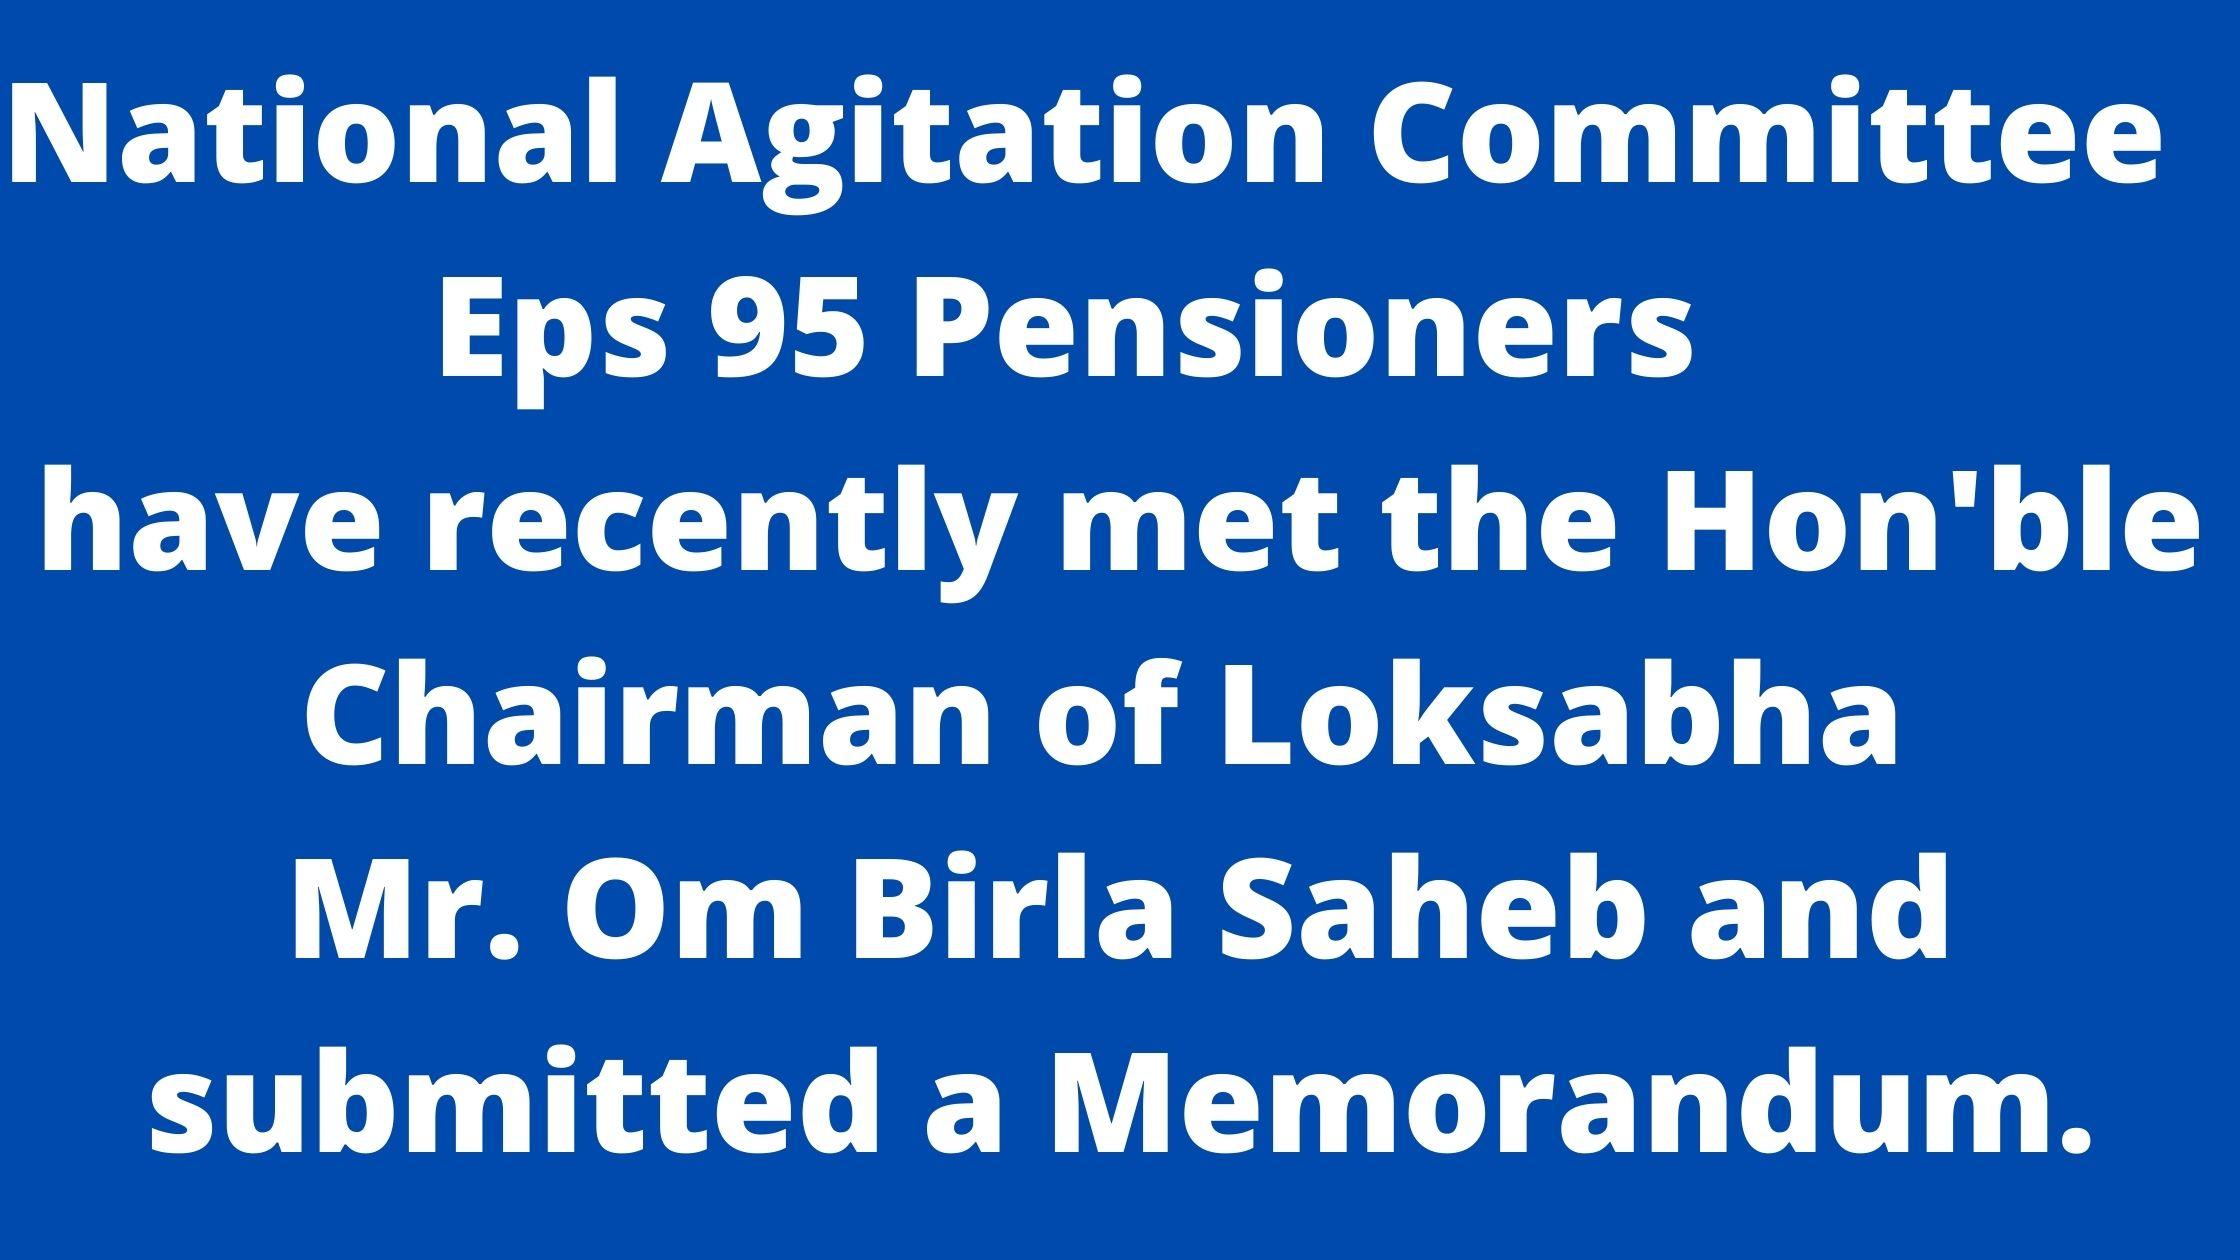 Eps 95 Pensioners Leaders met Hon'ble Chairman Loksabha